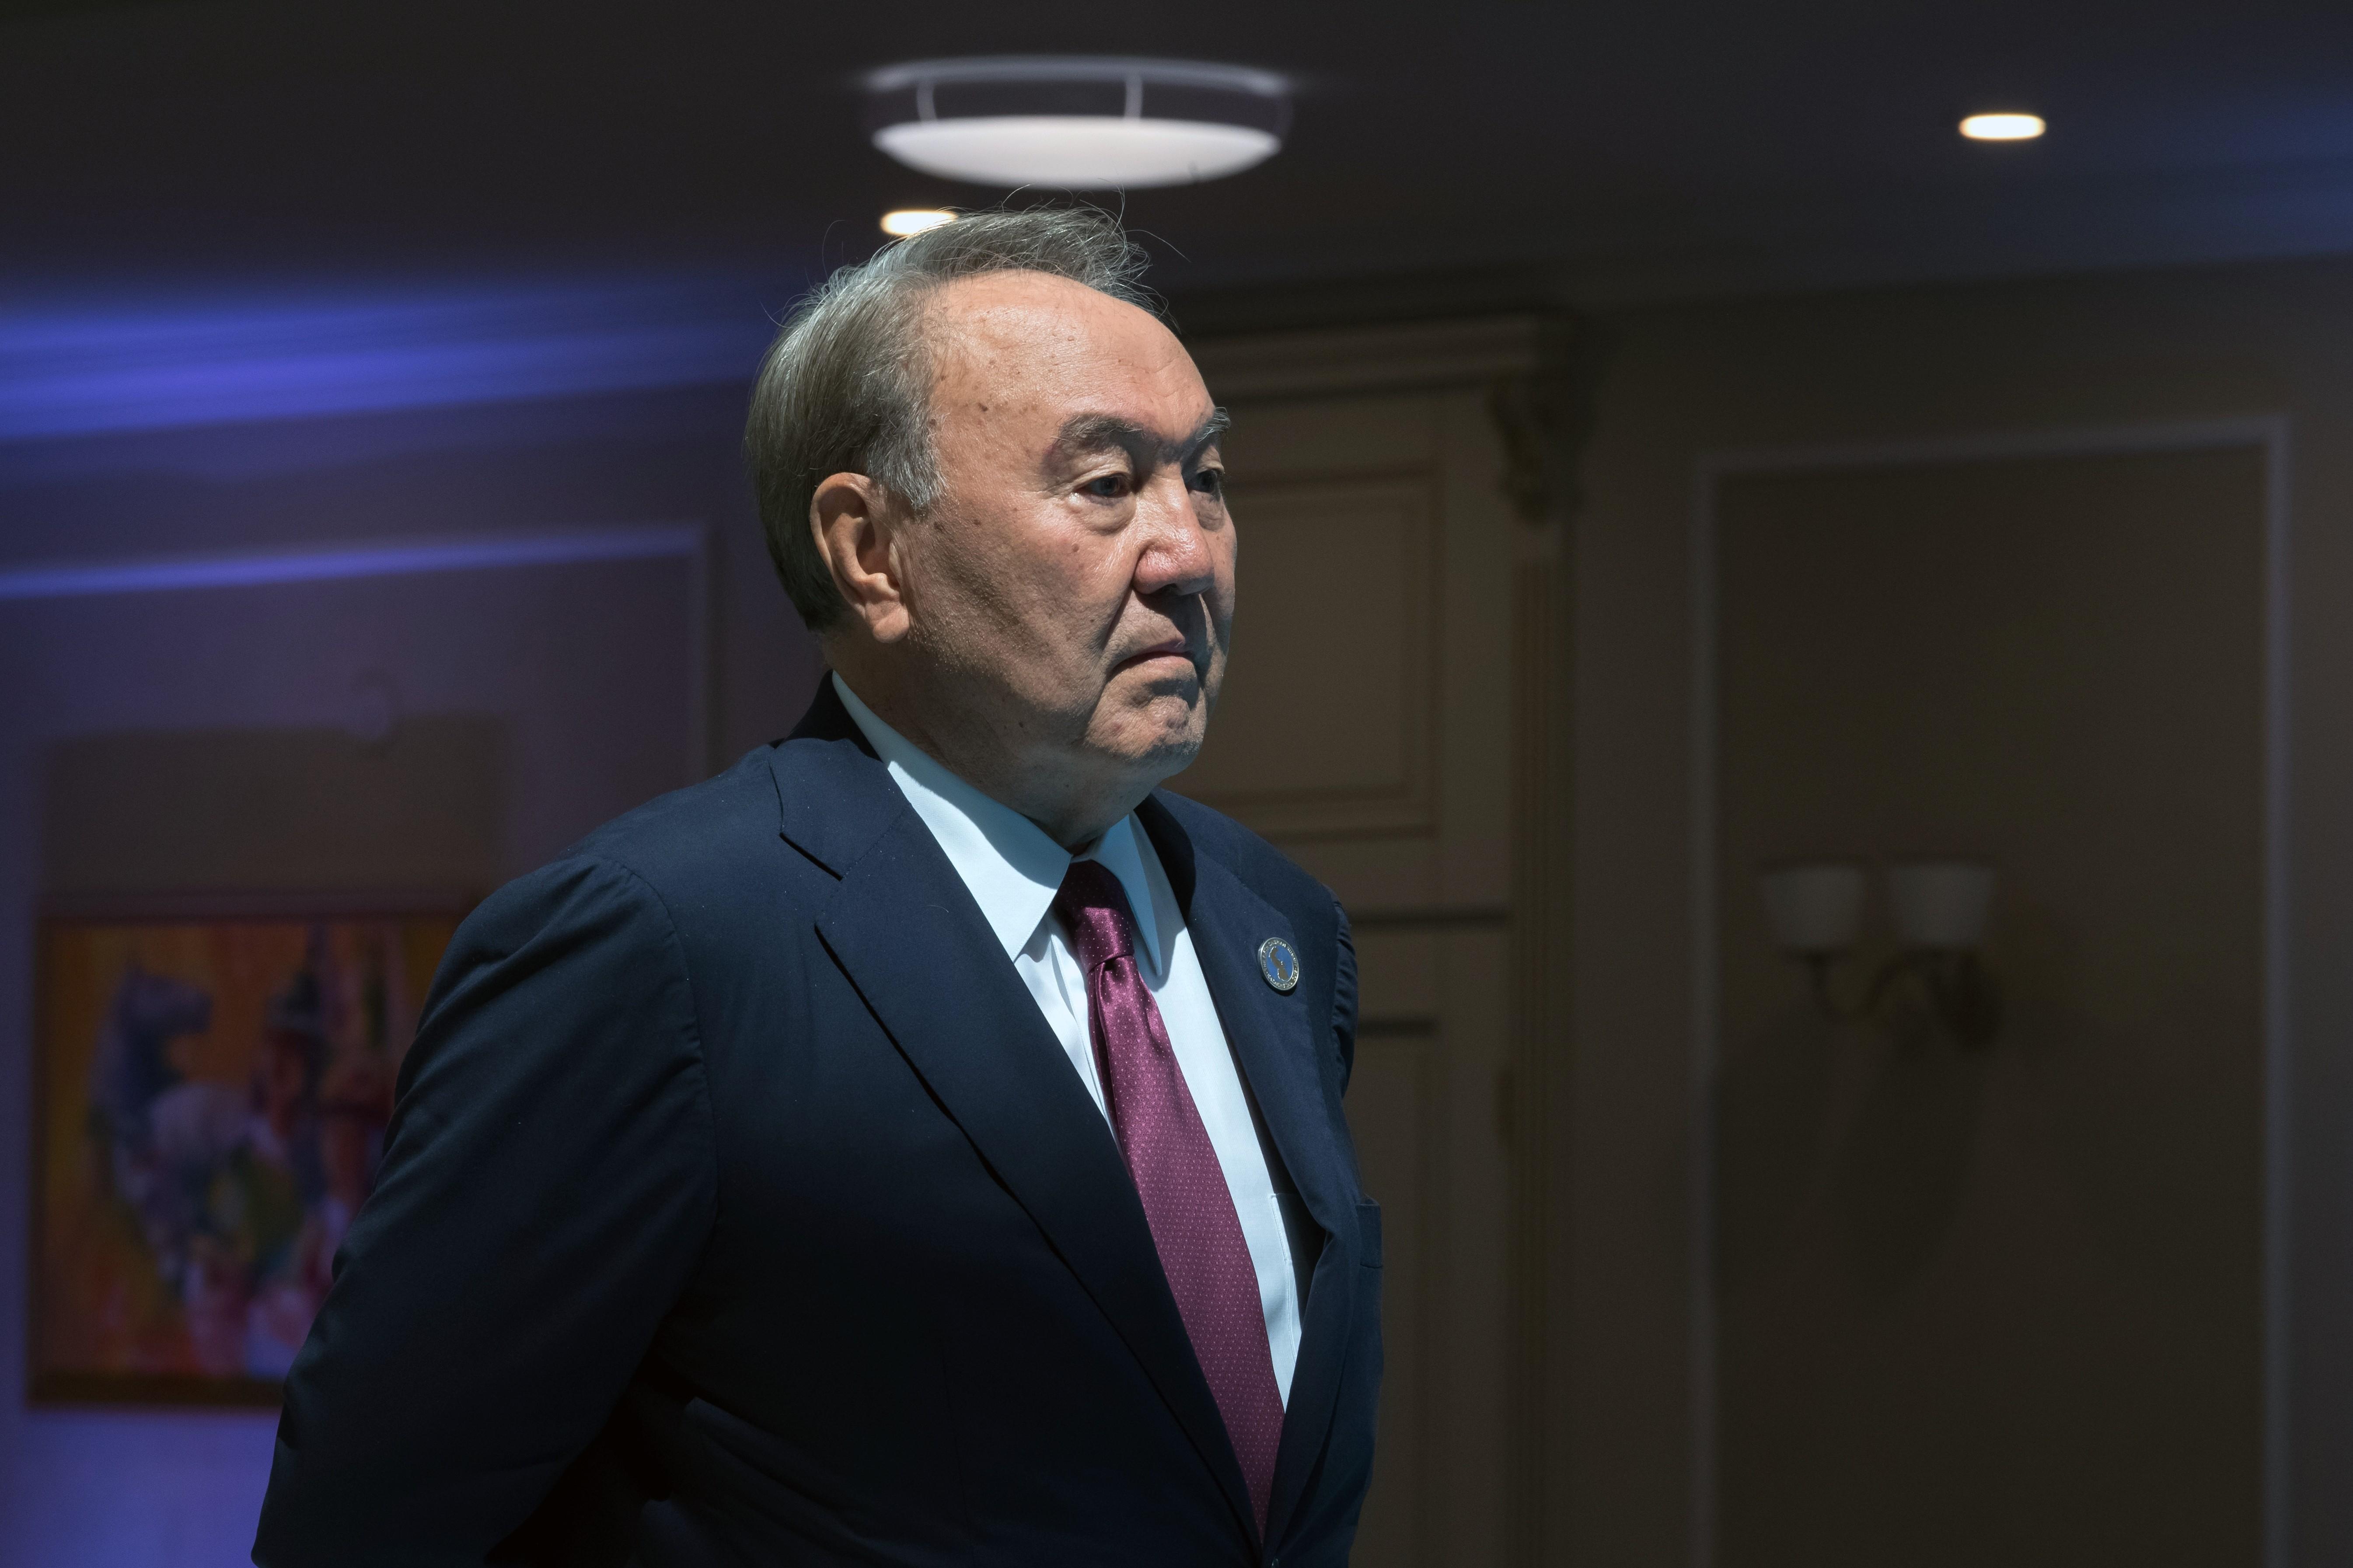 <p>Нурсултан Назрабаев. Фото: &copy;РИА Новости/Сергей Гунеев</p>